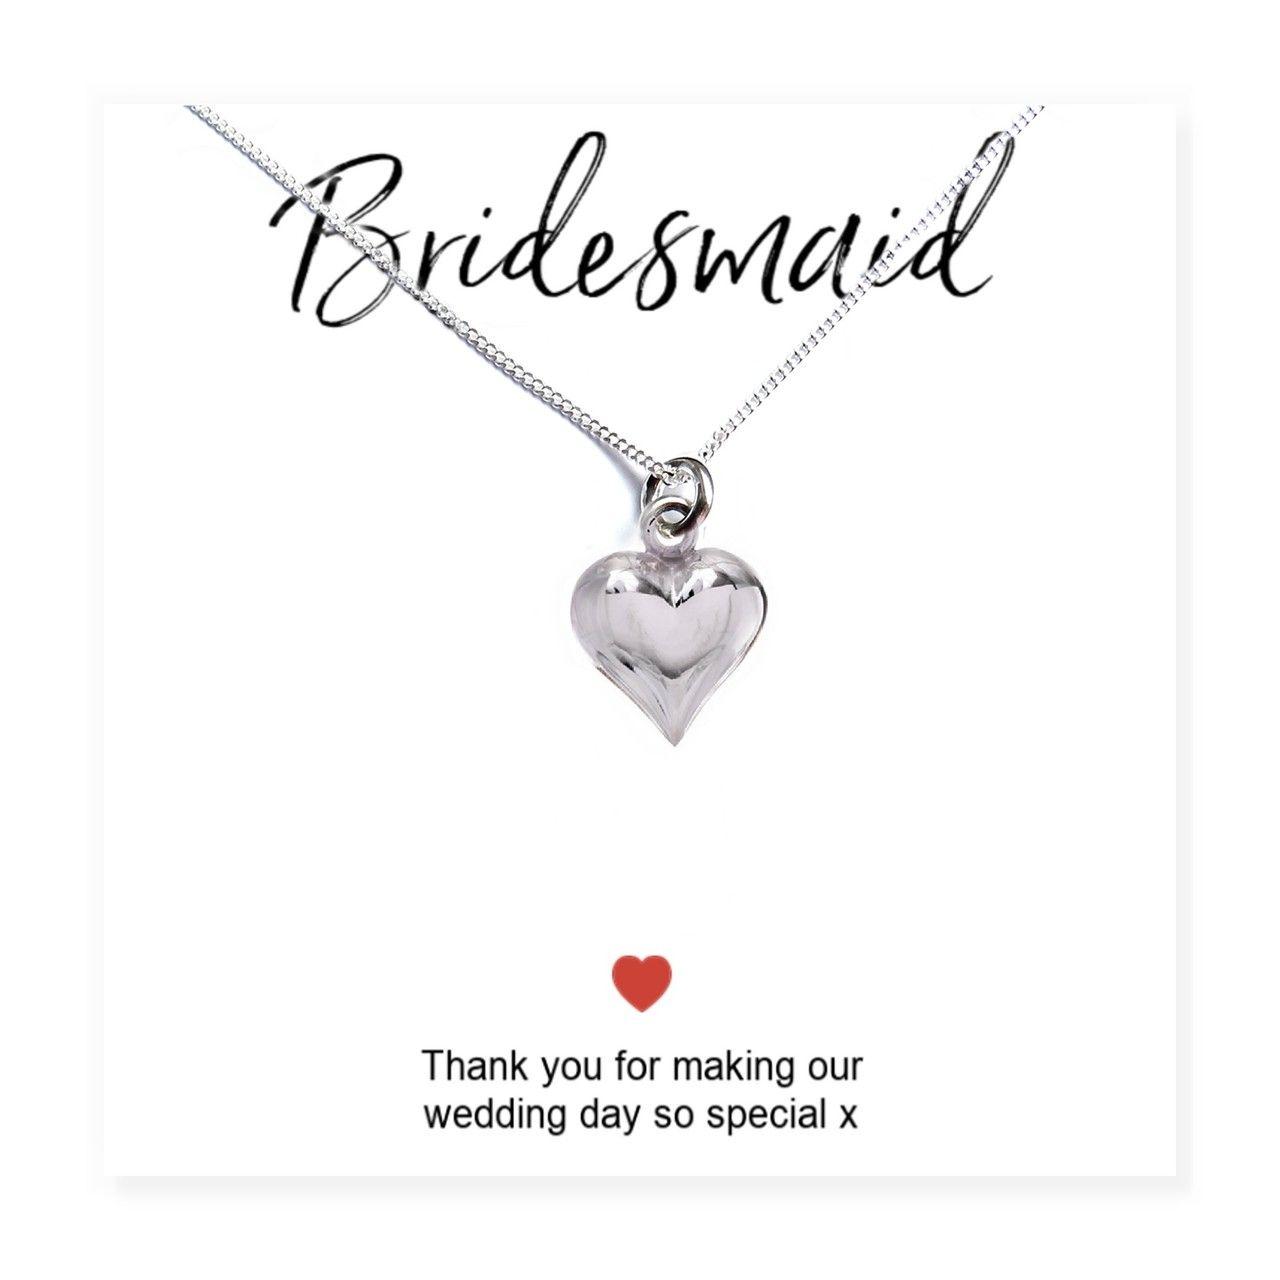 Bridesmaids heart necklace thank you card uk aye do